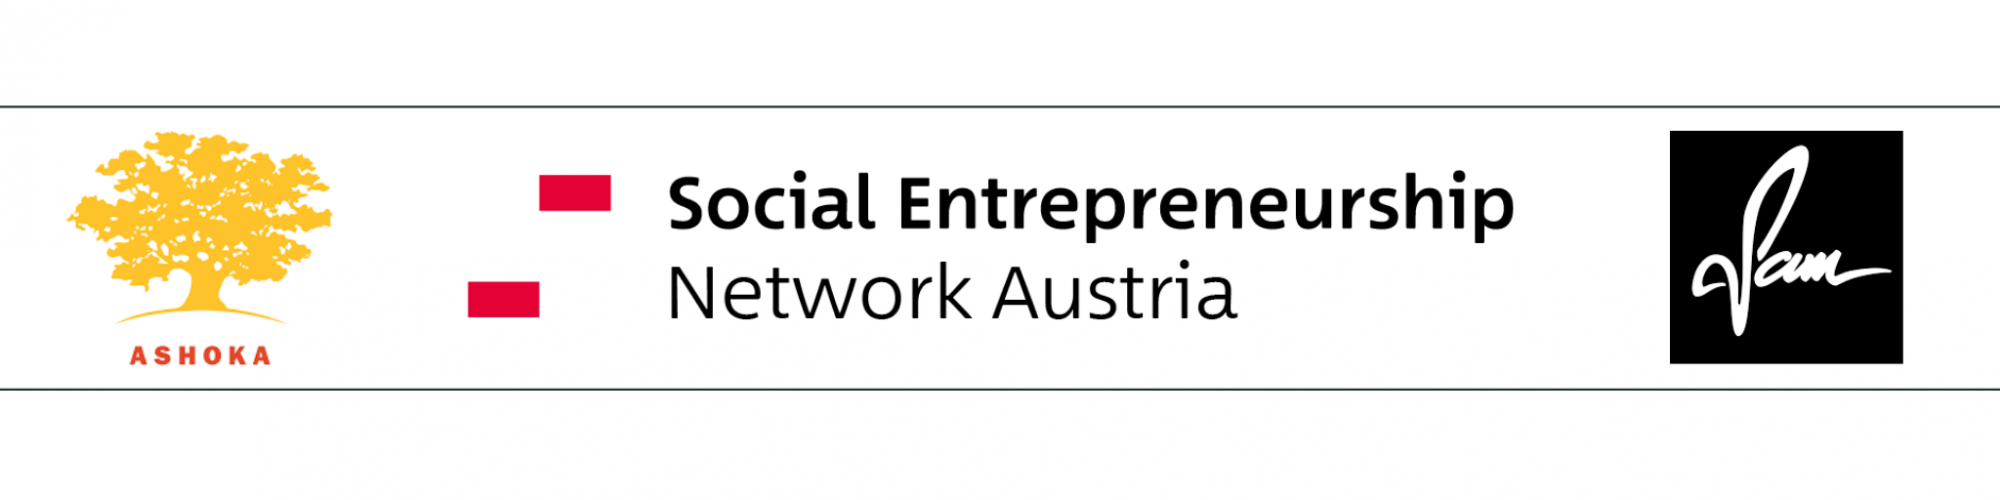 Social Entrepreneurship Network Austria